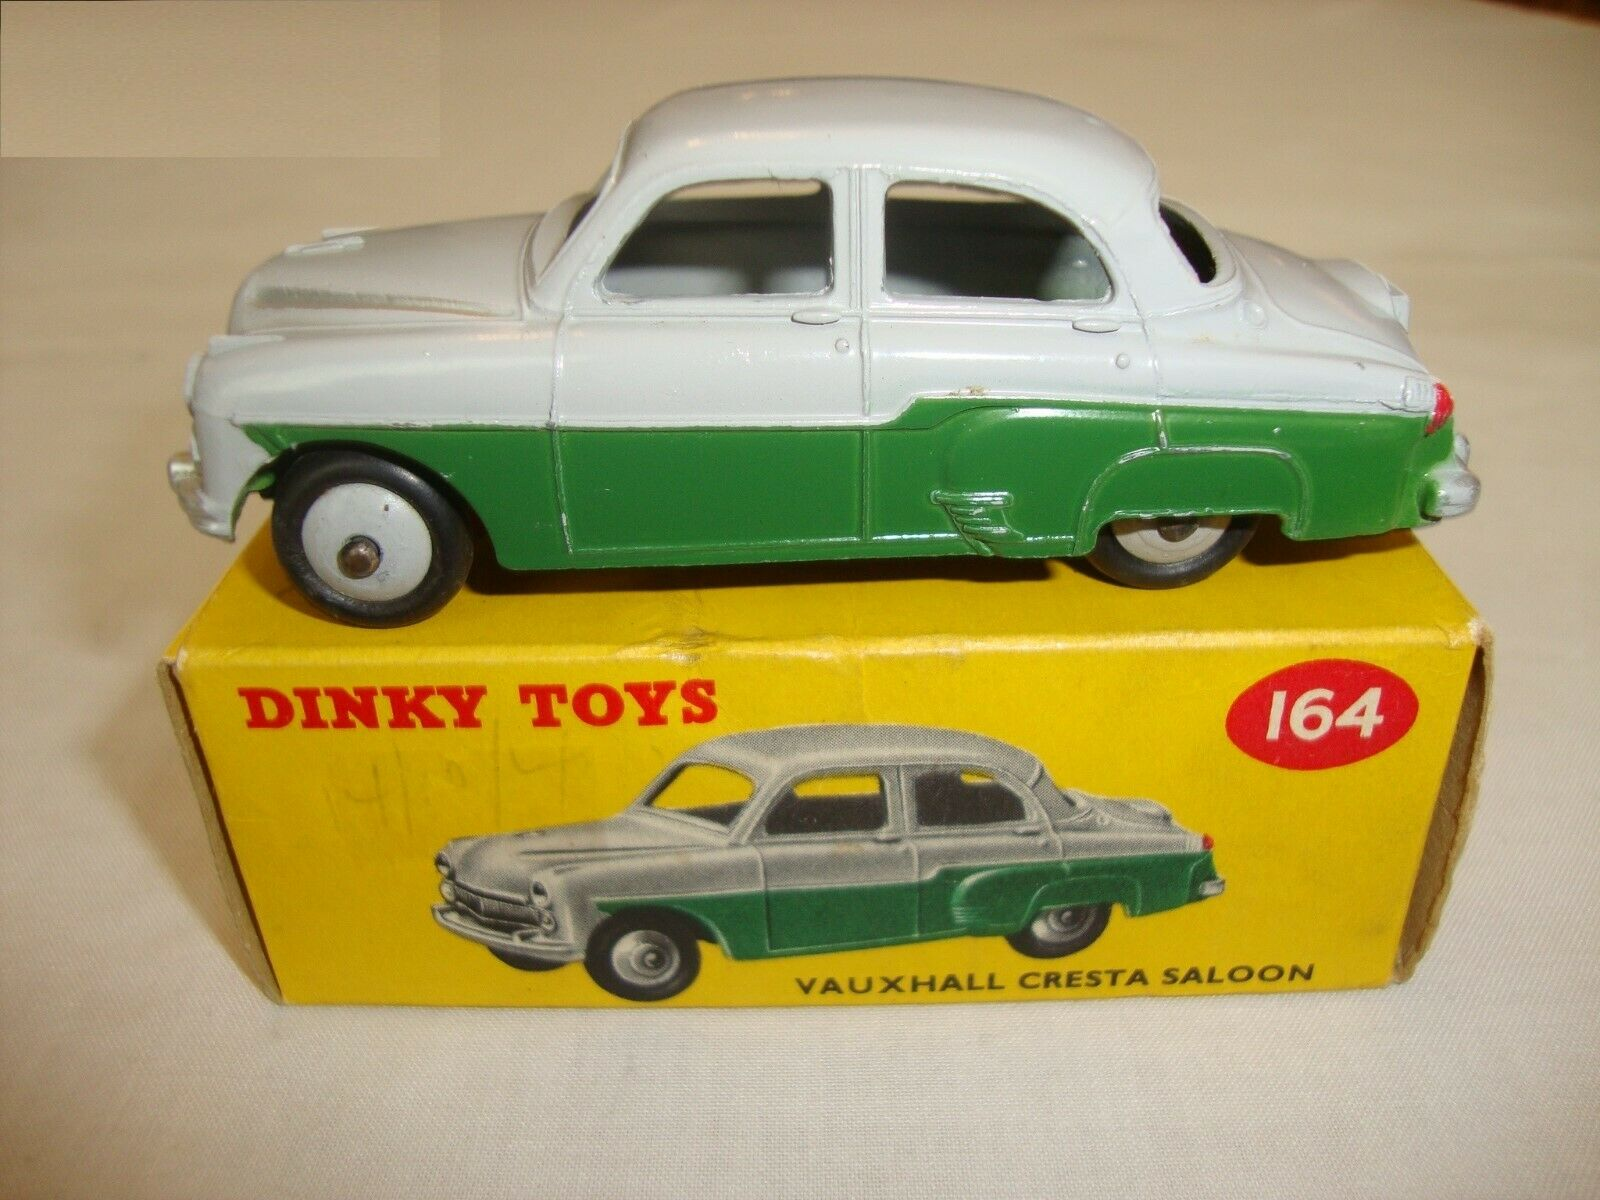 DINKY 164 VAUXHALL CRESTA SALOON - EXCELLENT in original BOX